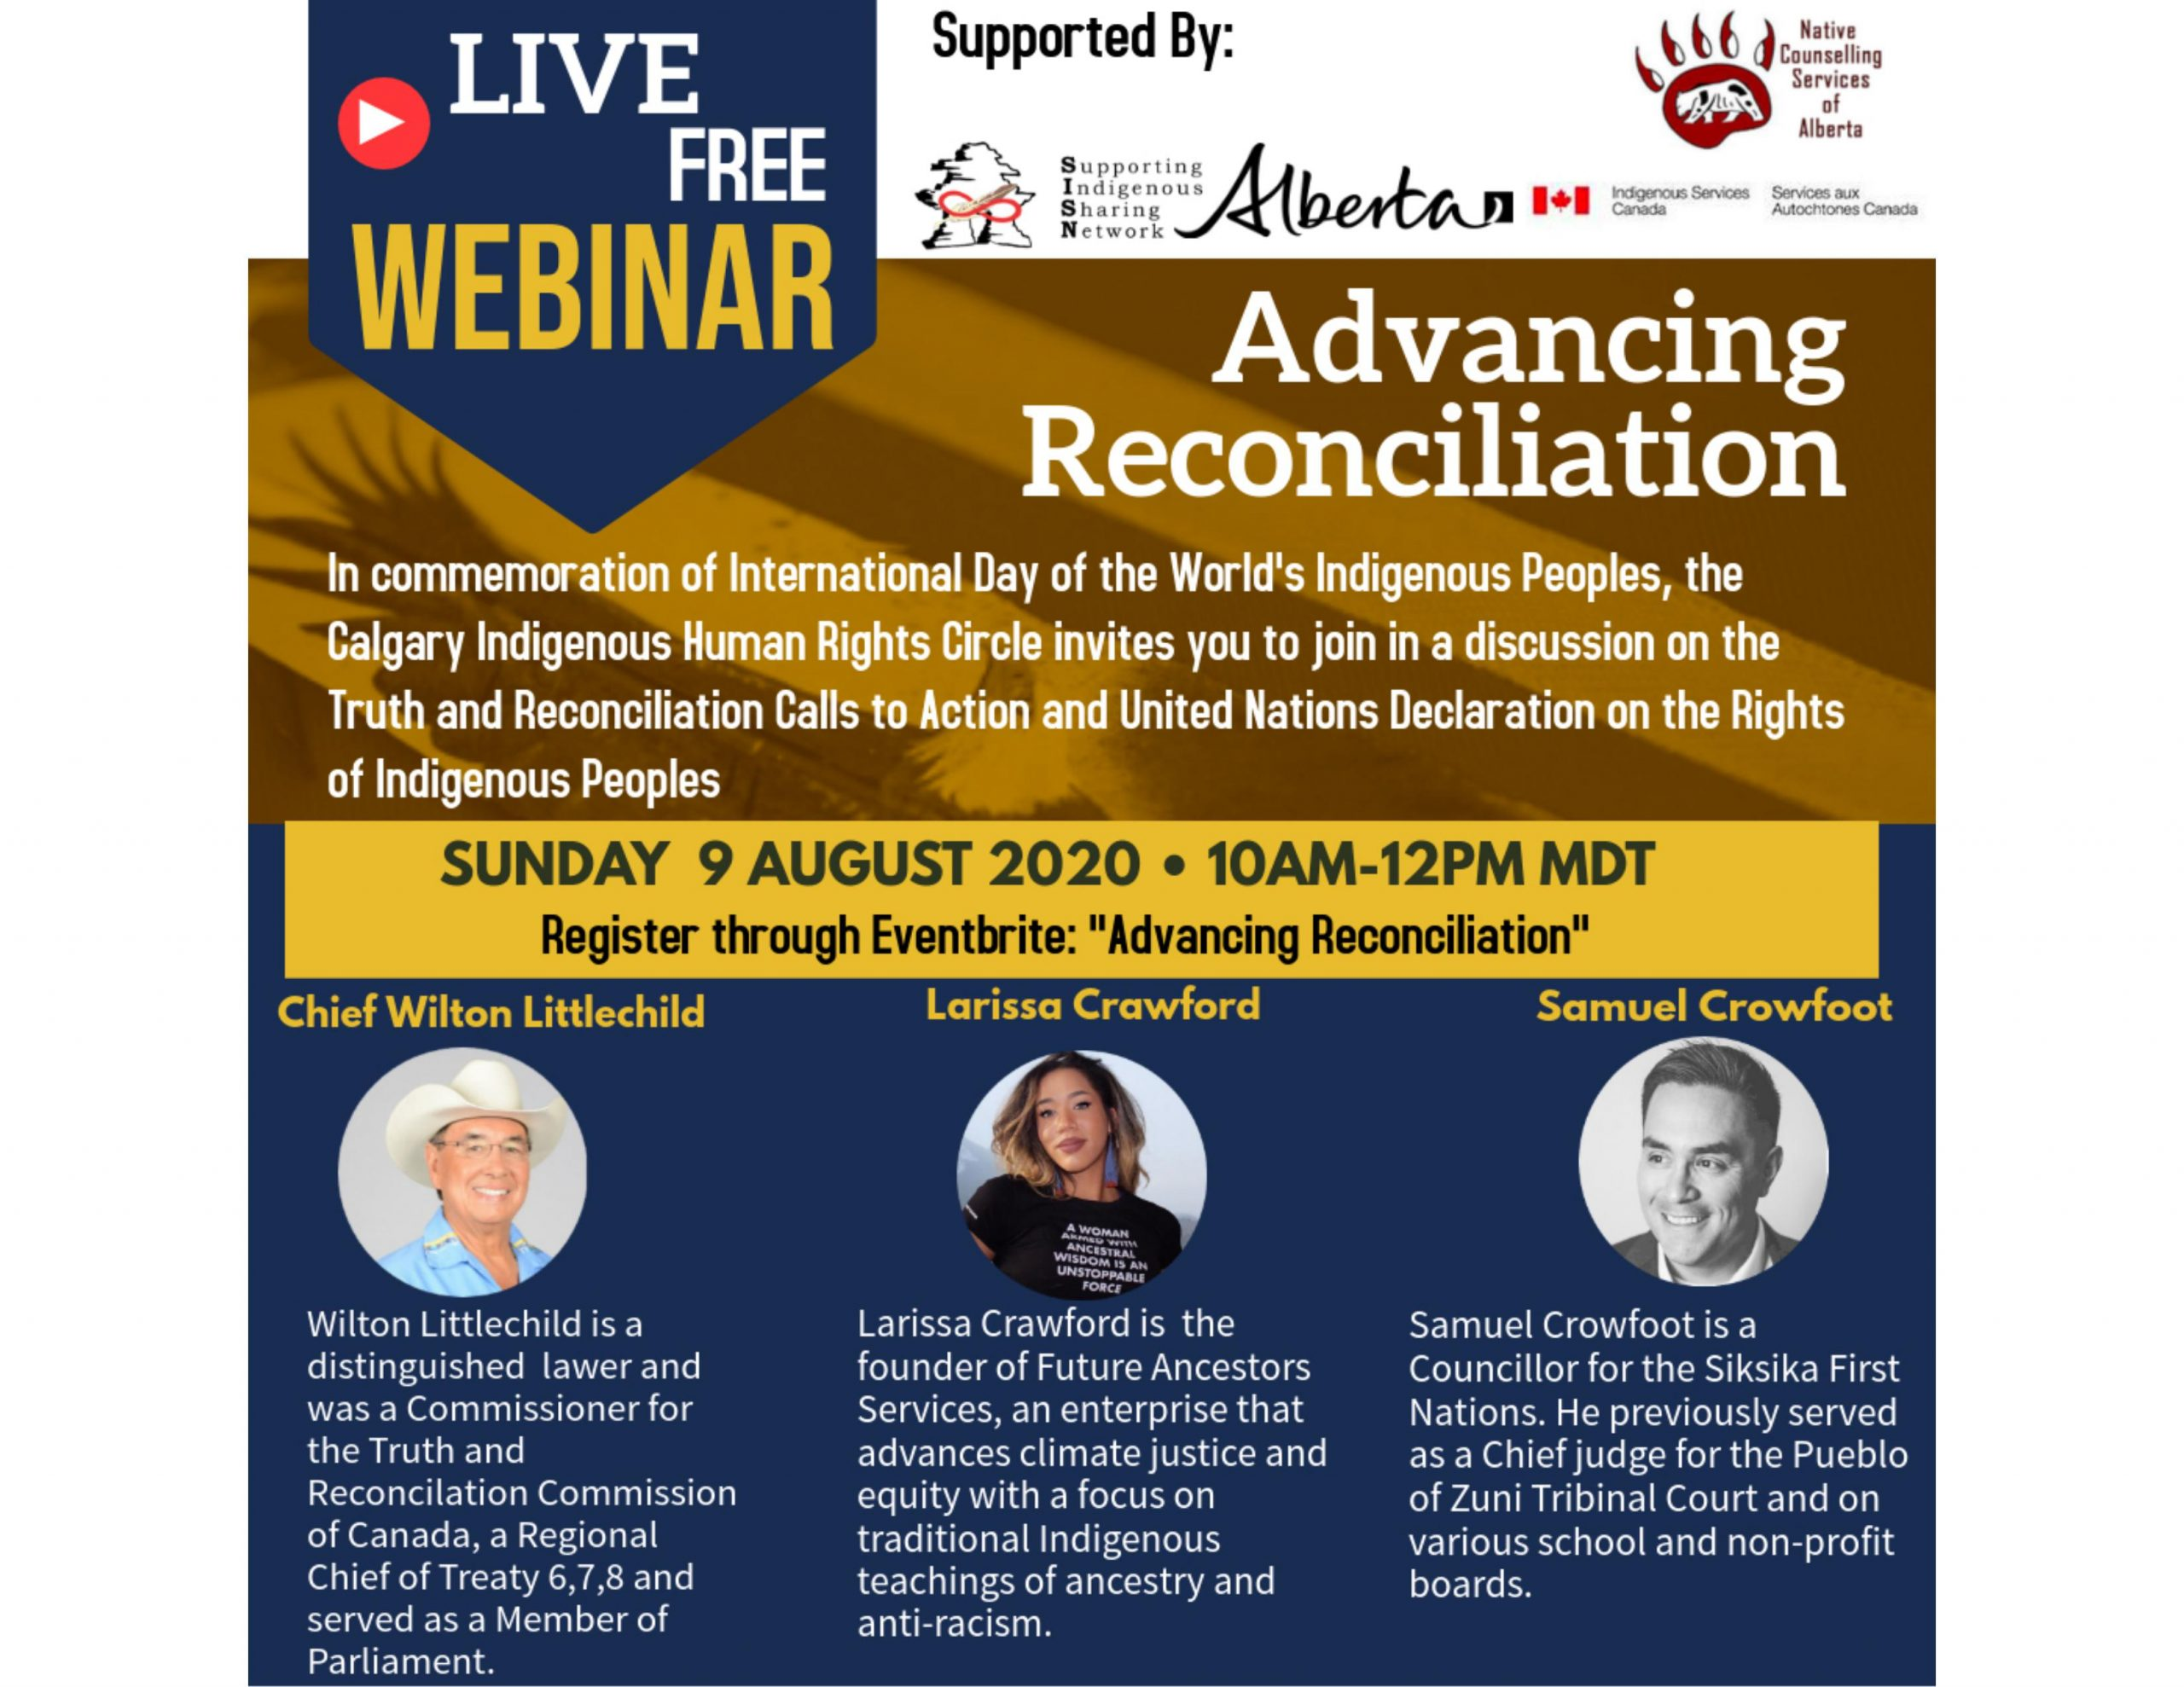 Advancing Reconciliation webinar – August 9